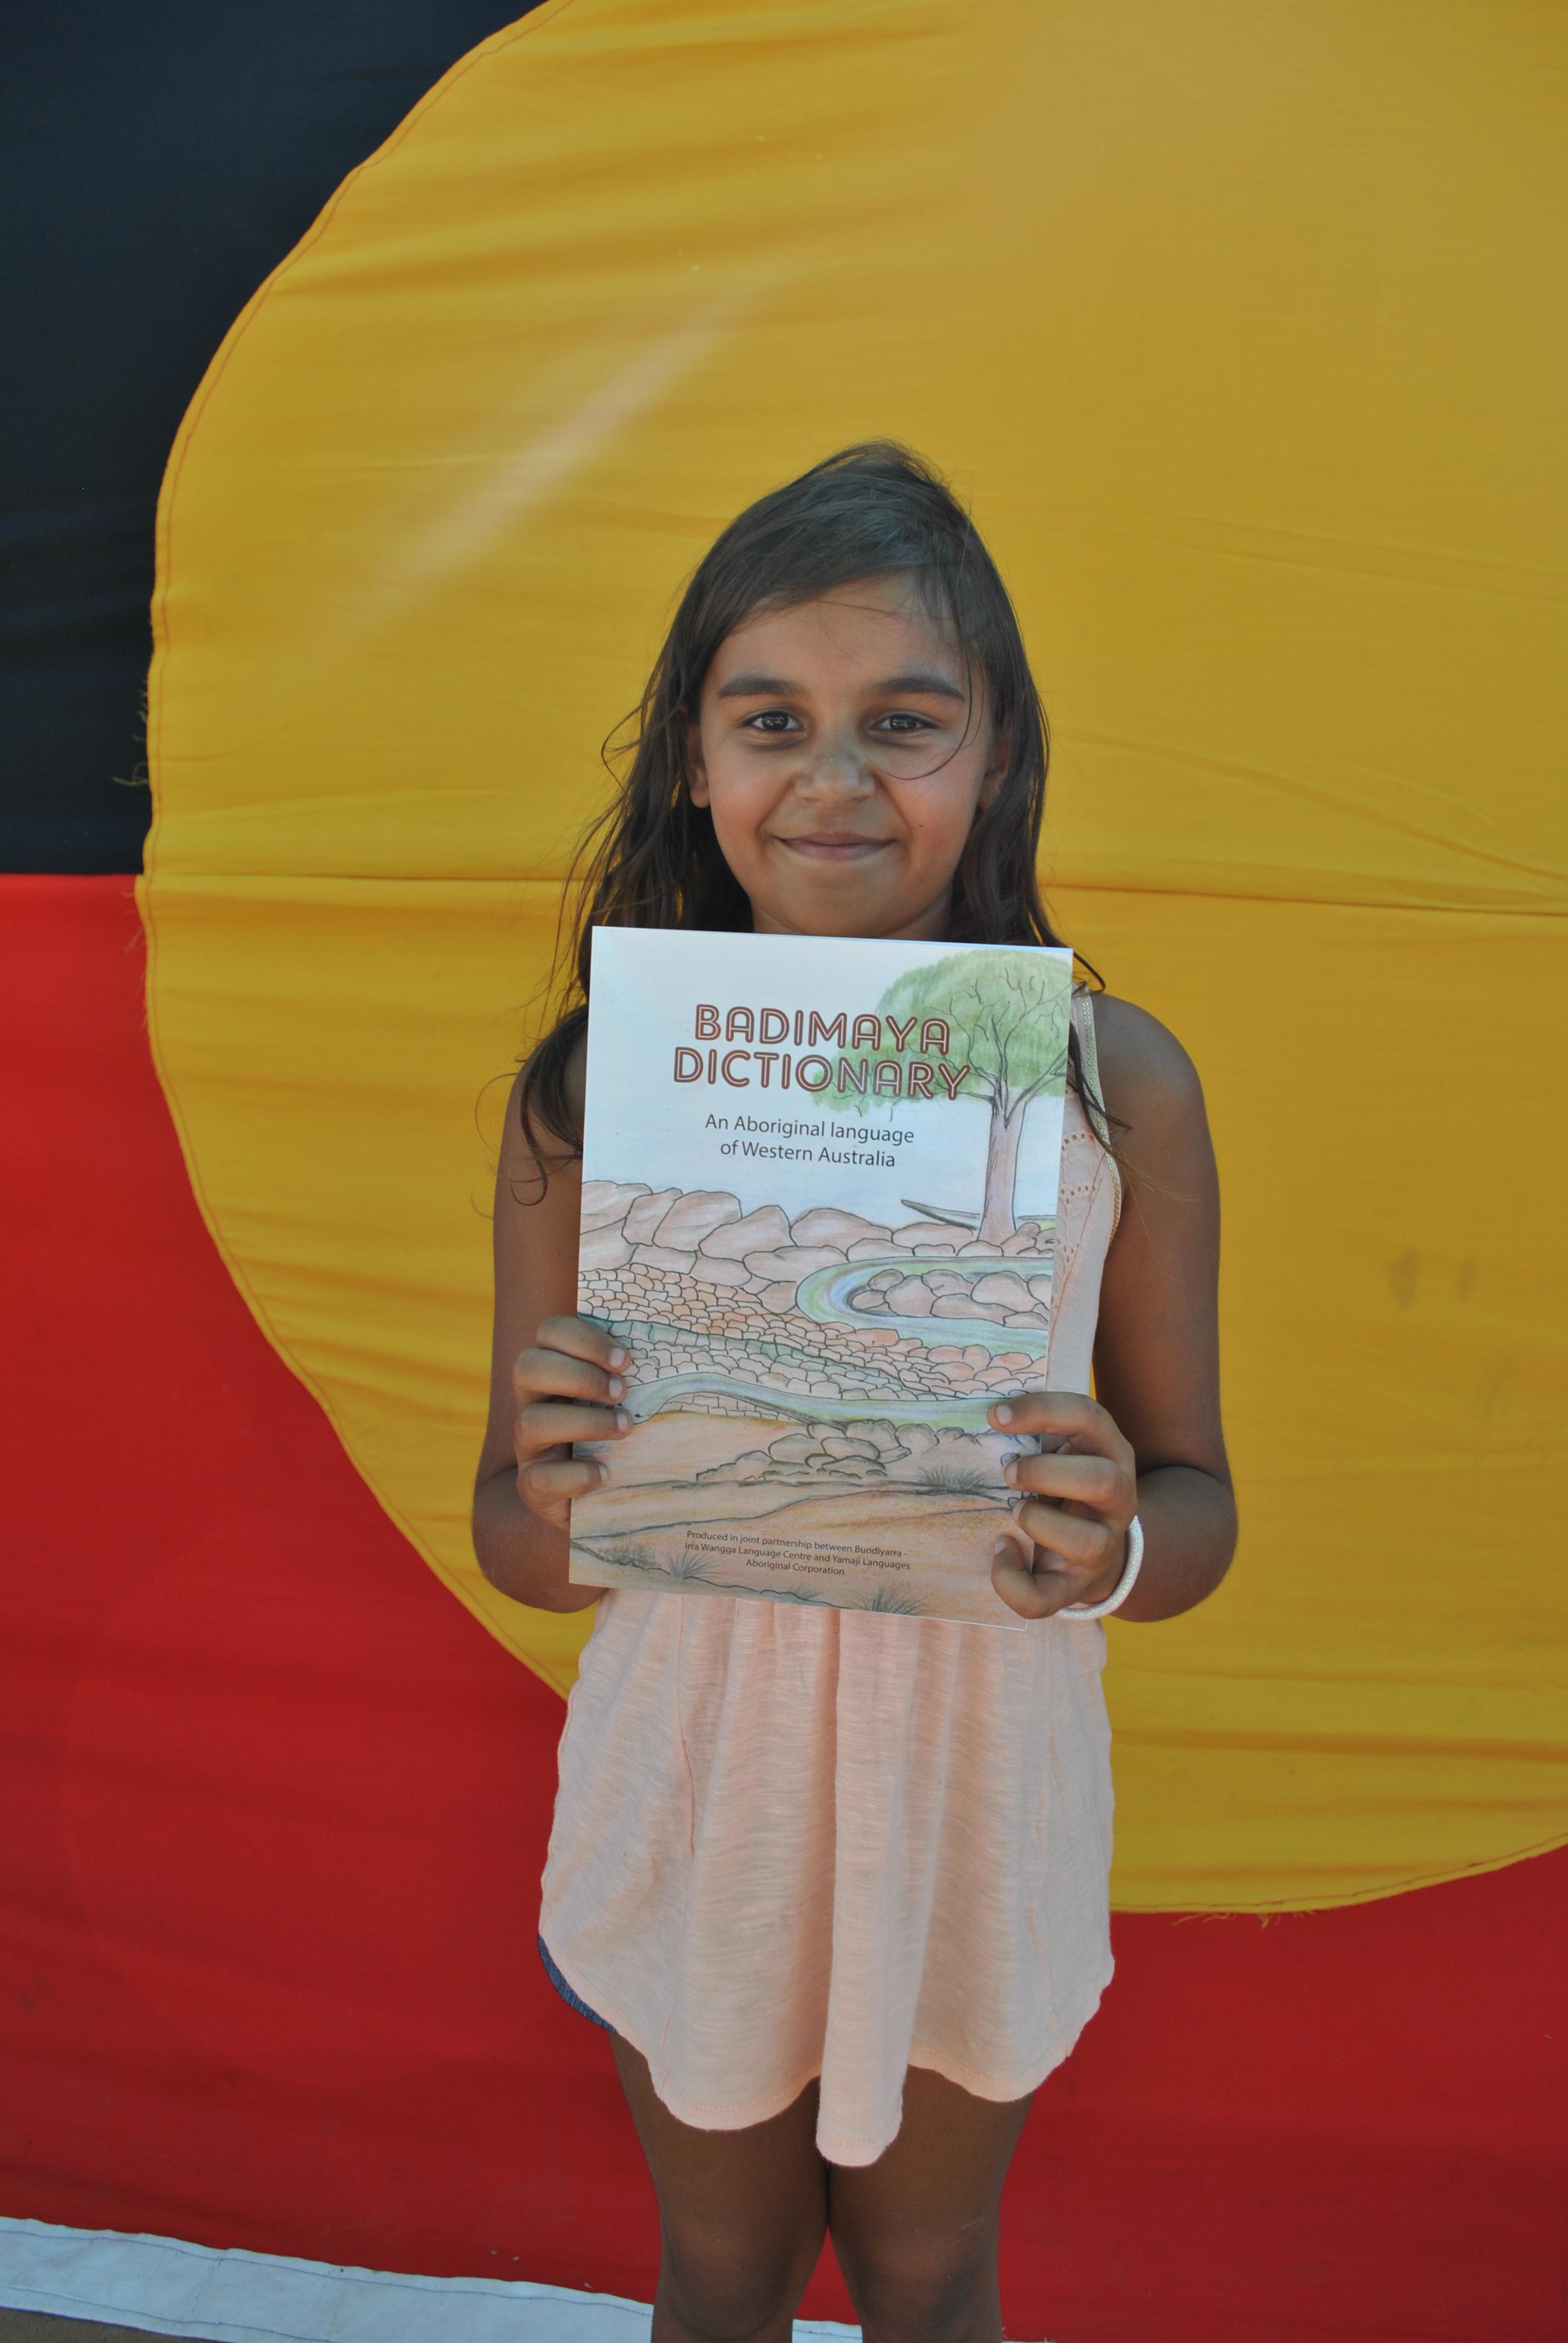 Tykeira Ward at the launch of the Badimaya Dictionary